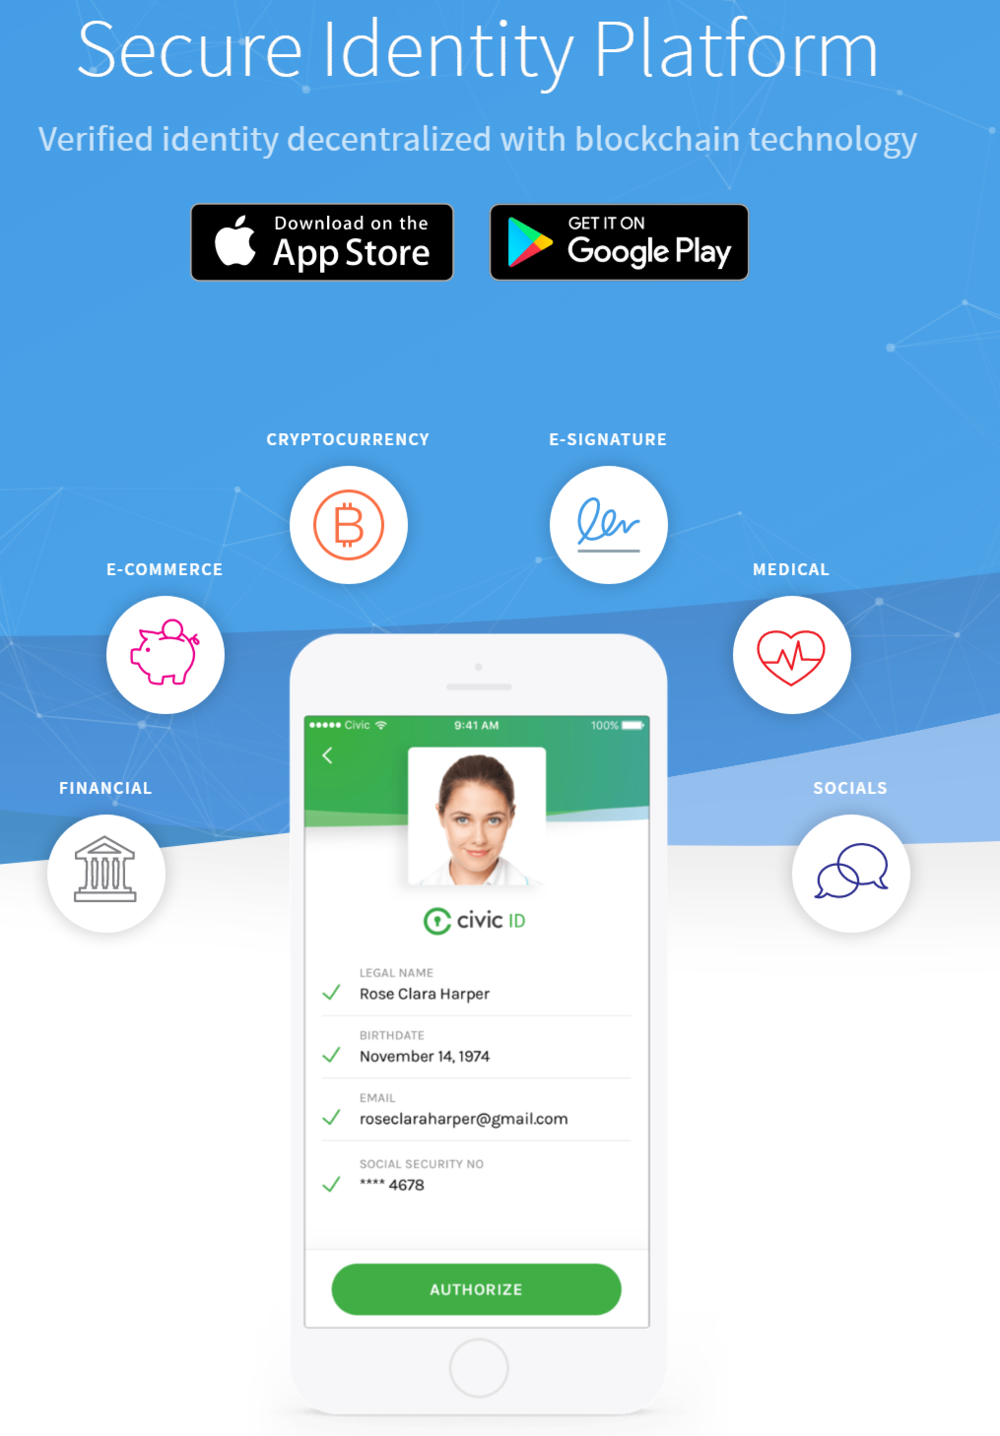 Civic –A secure identity platform